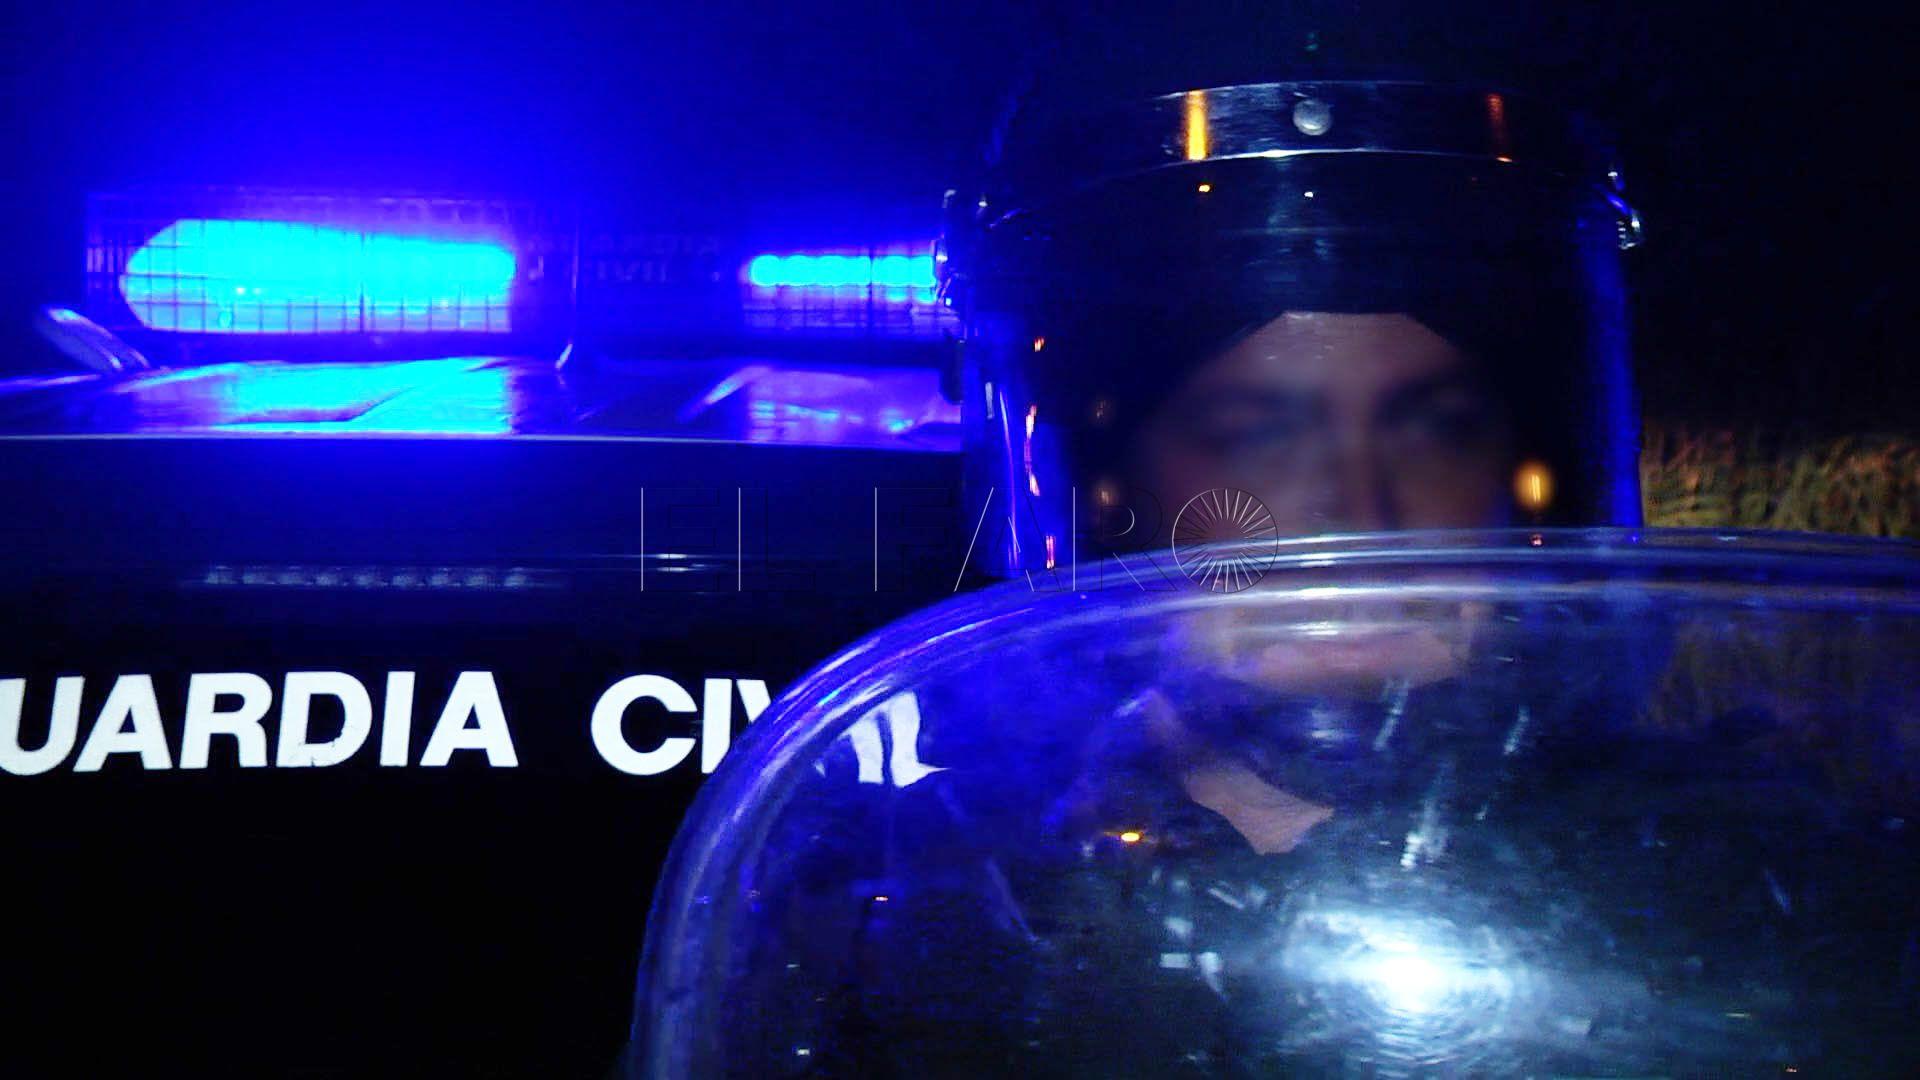 guardia-civil-ceuta-grs-usecic-2